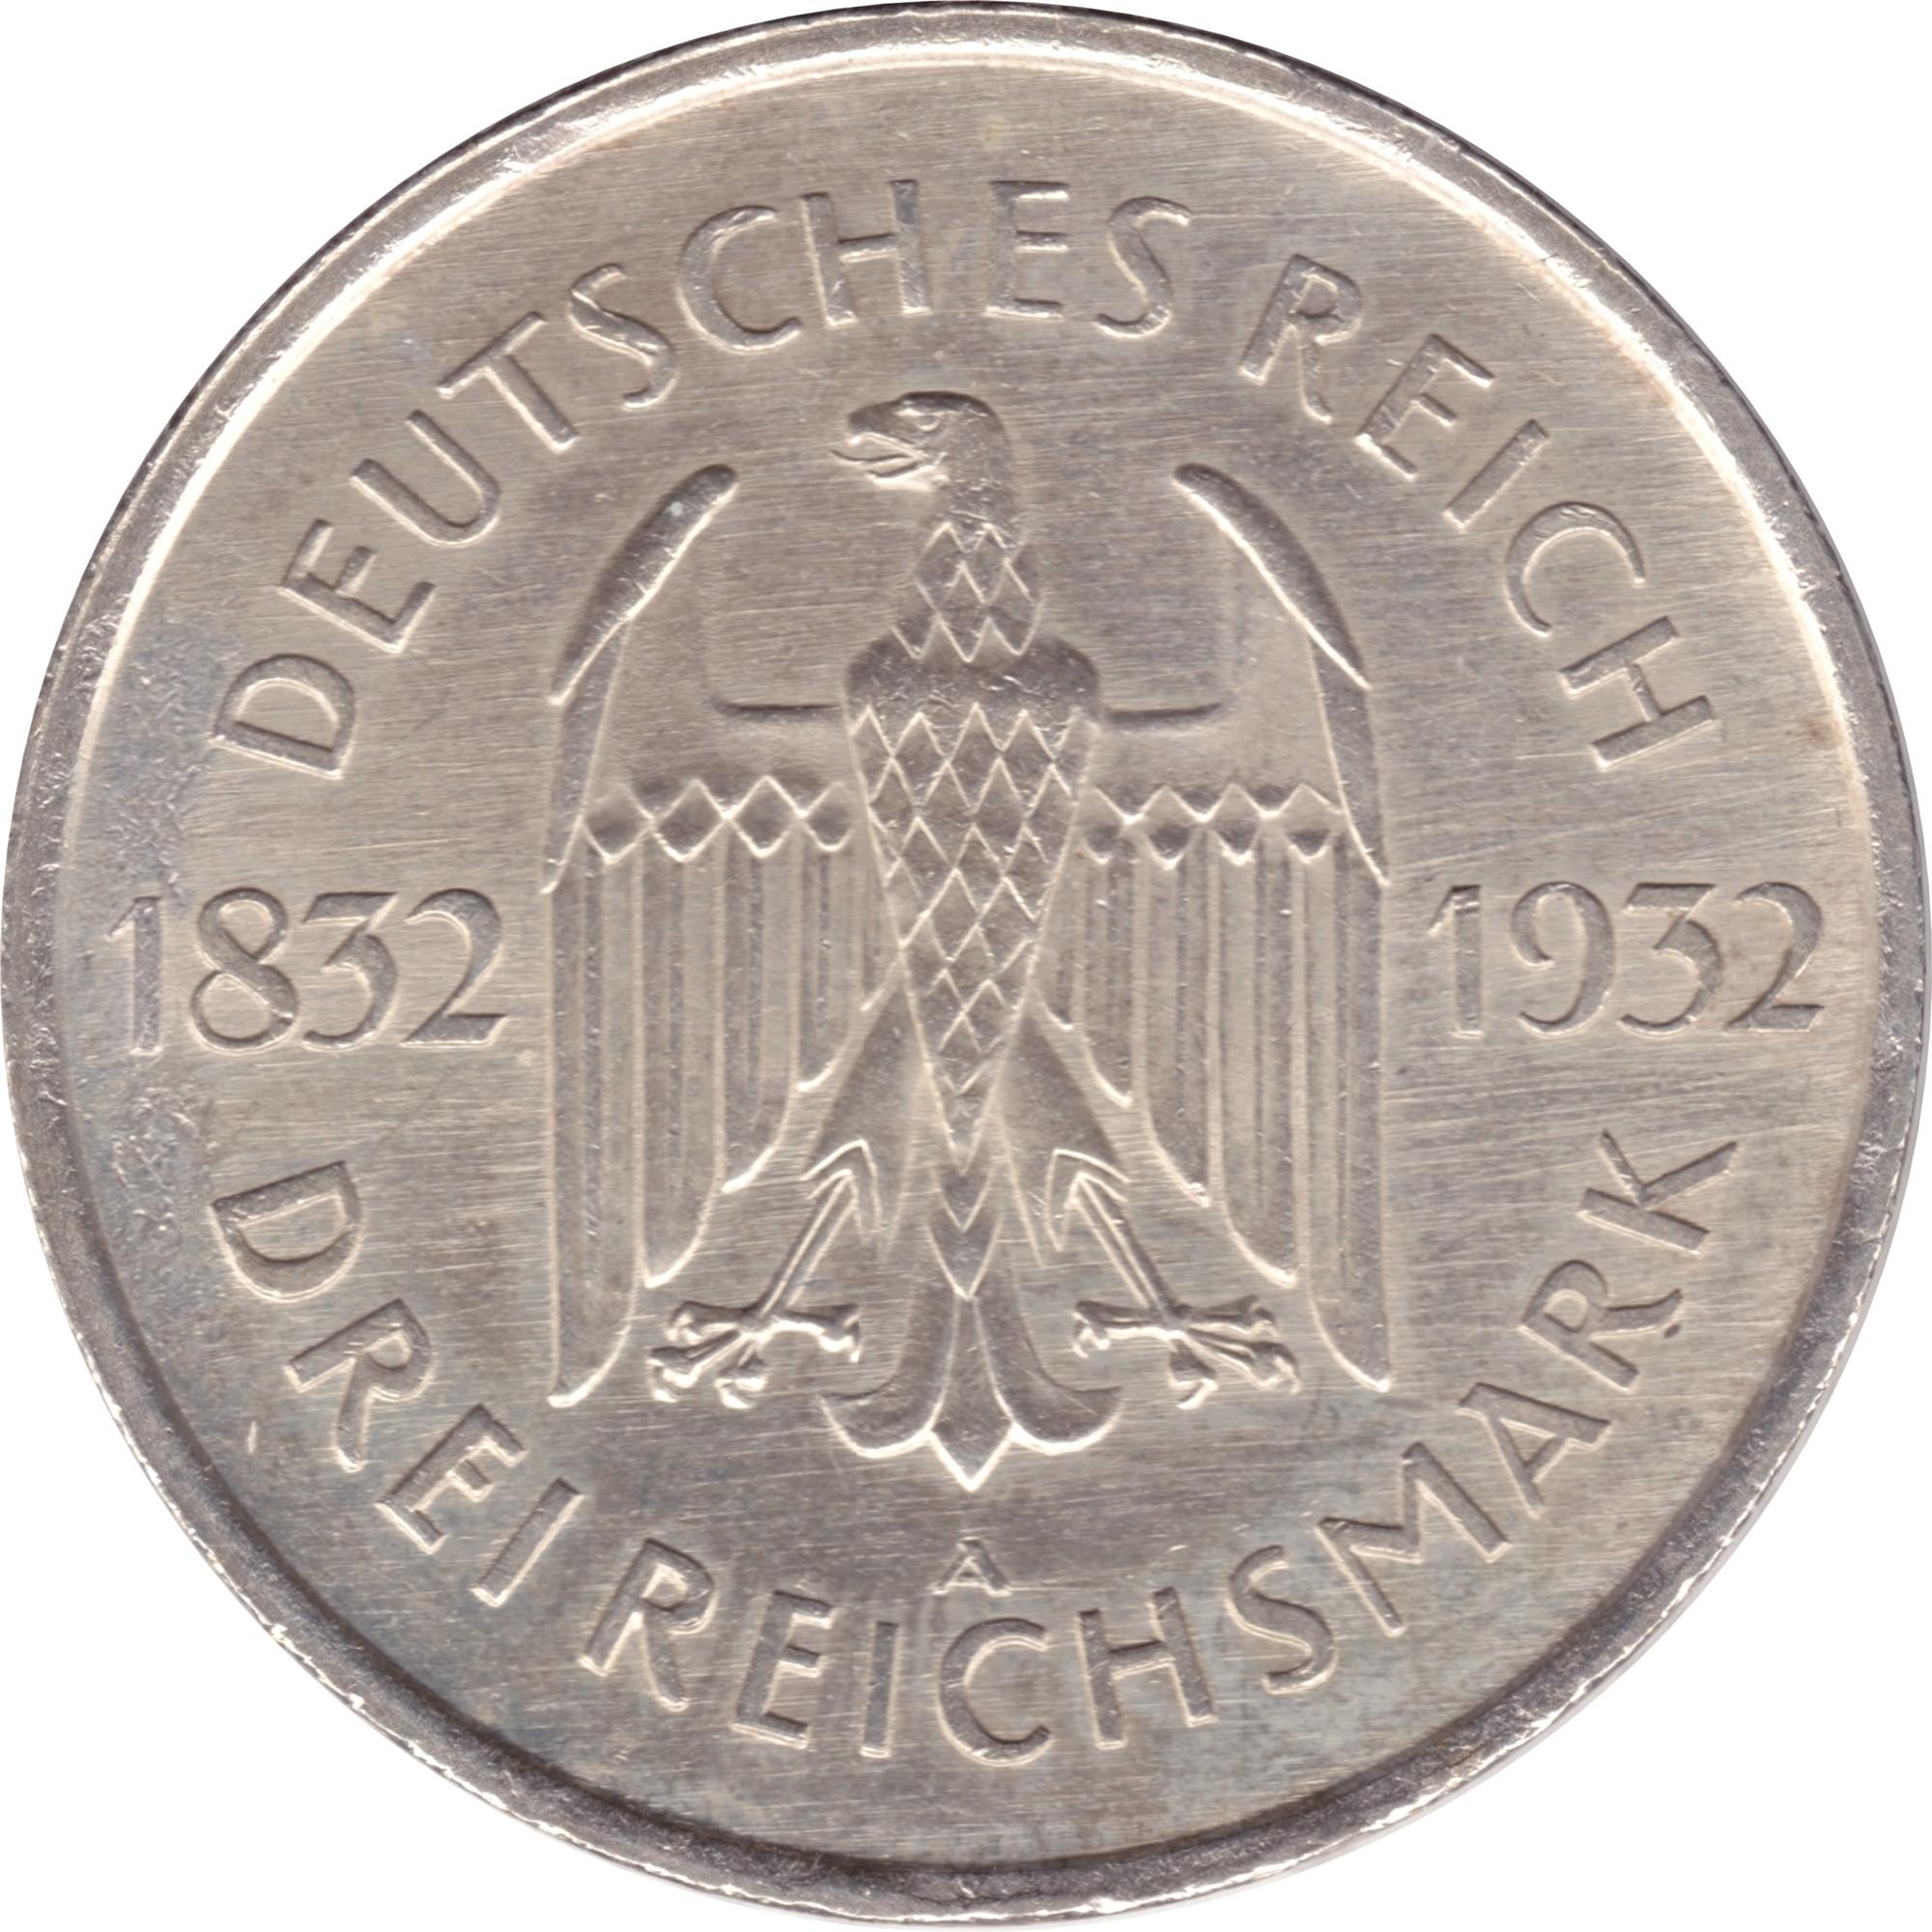 Germany 3 Reichsmark (1932 Goethe)